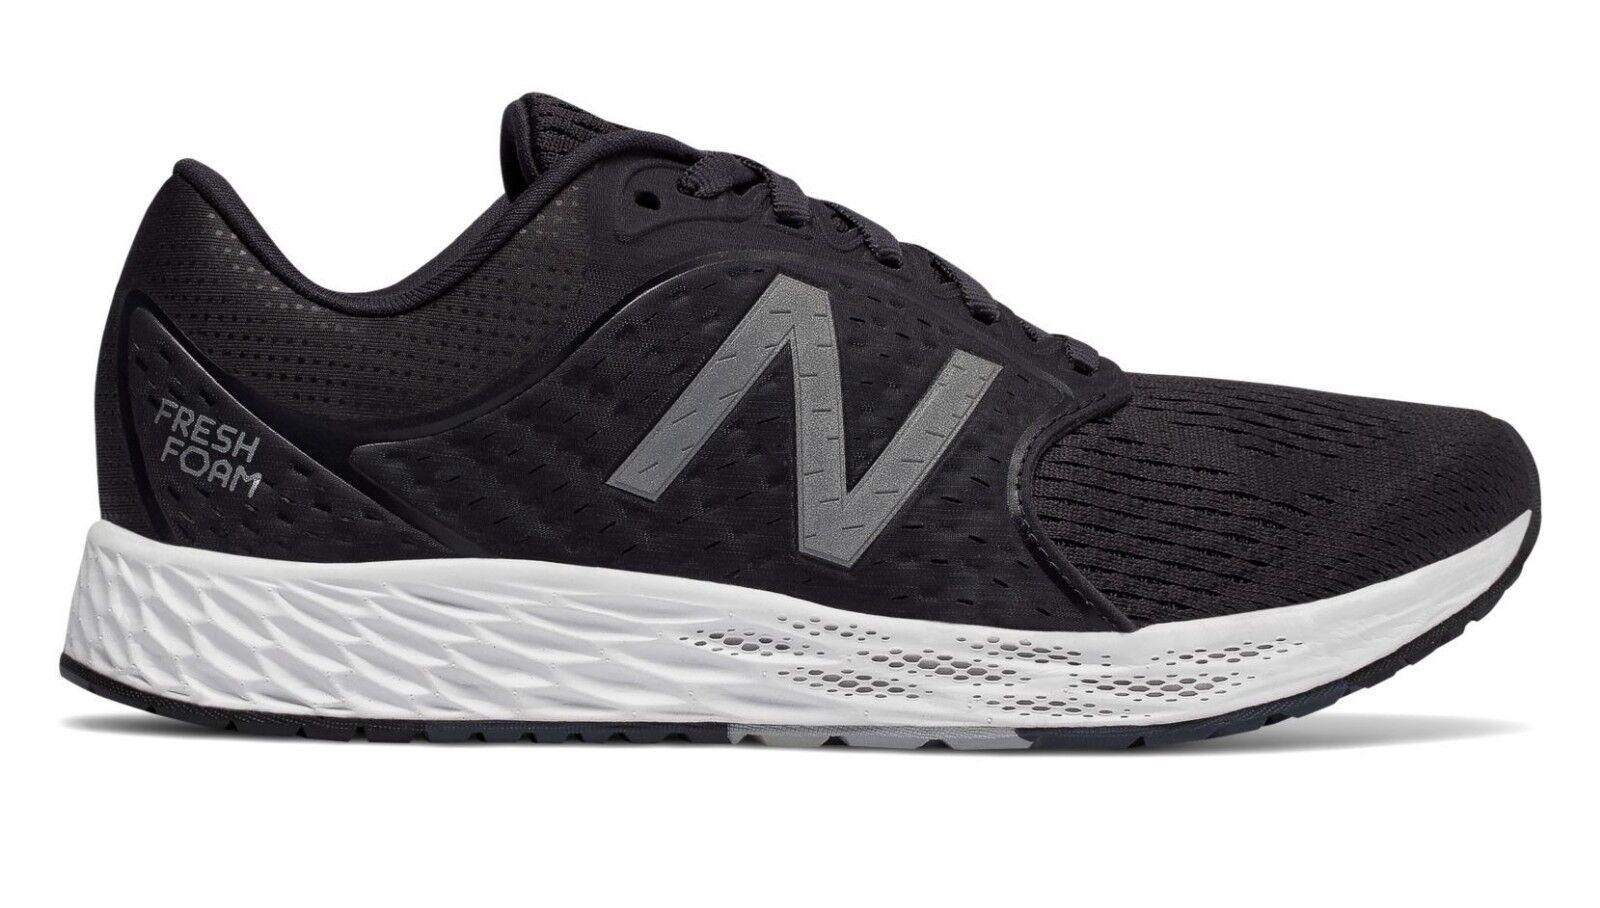 Zapatos promocionales para hombres y mujeres NEW BALANCE Fresh Foam W Zante v4 Damen Laufschuhe Running Schuhe black schwarz